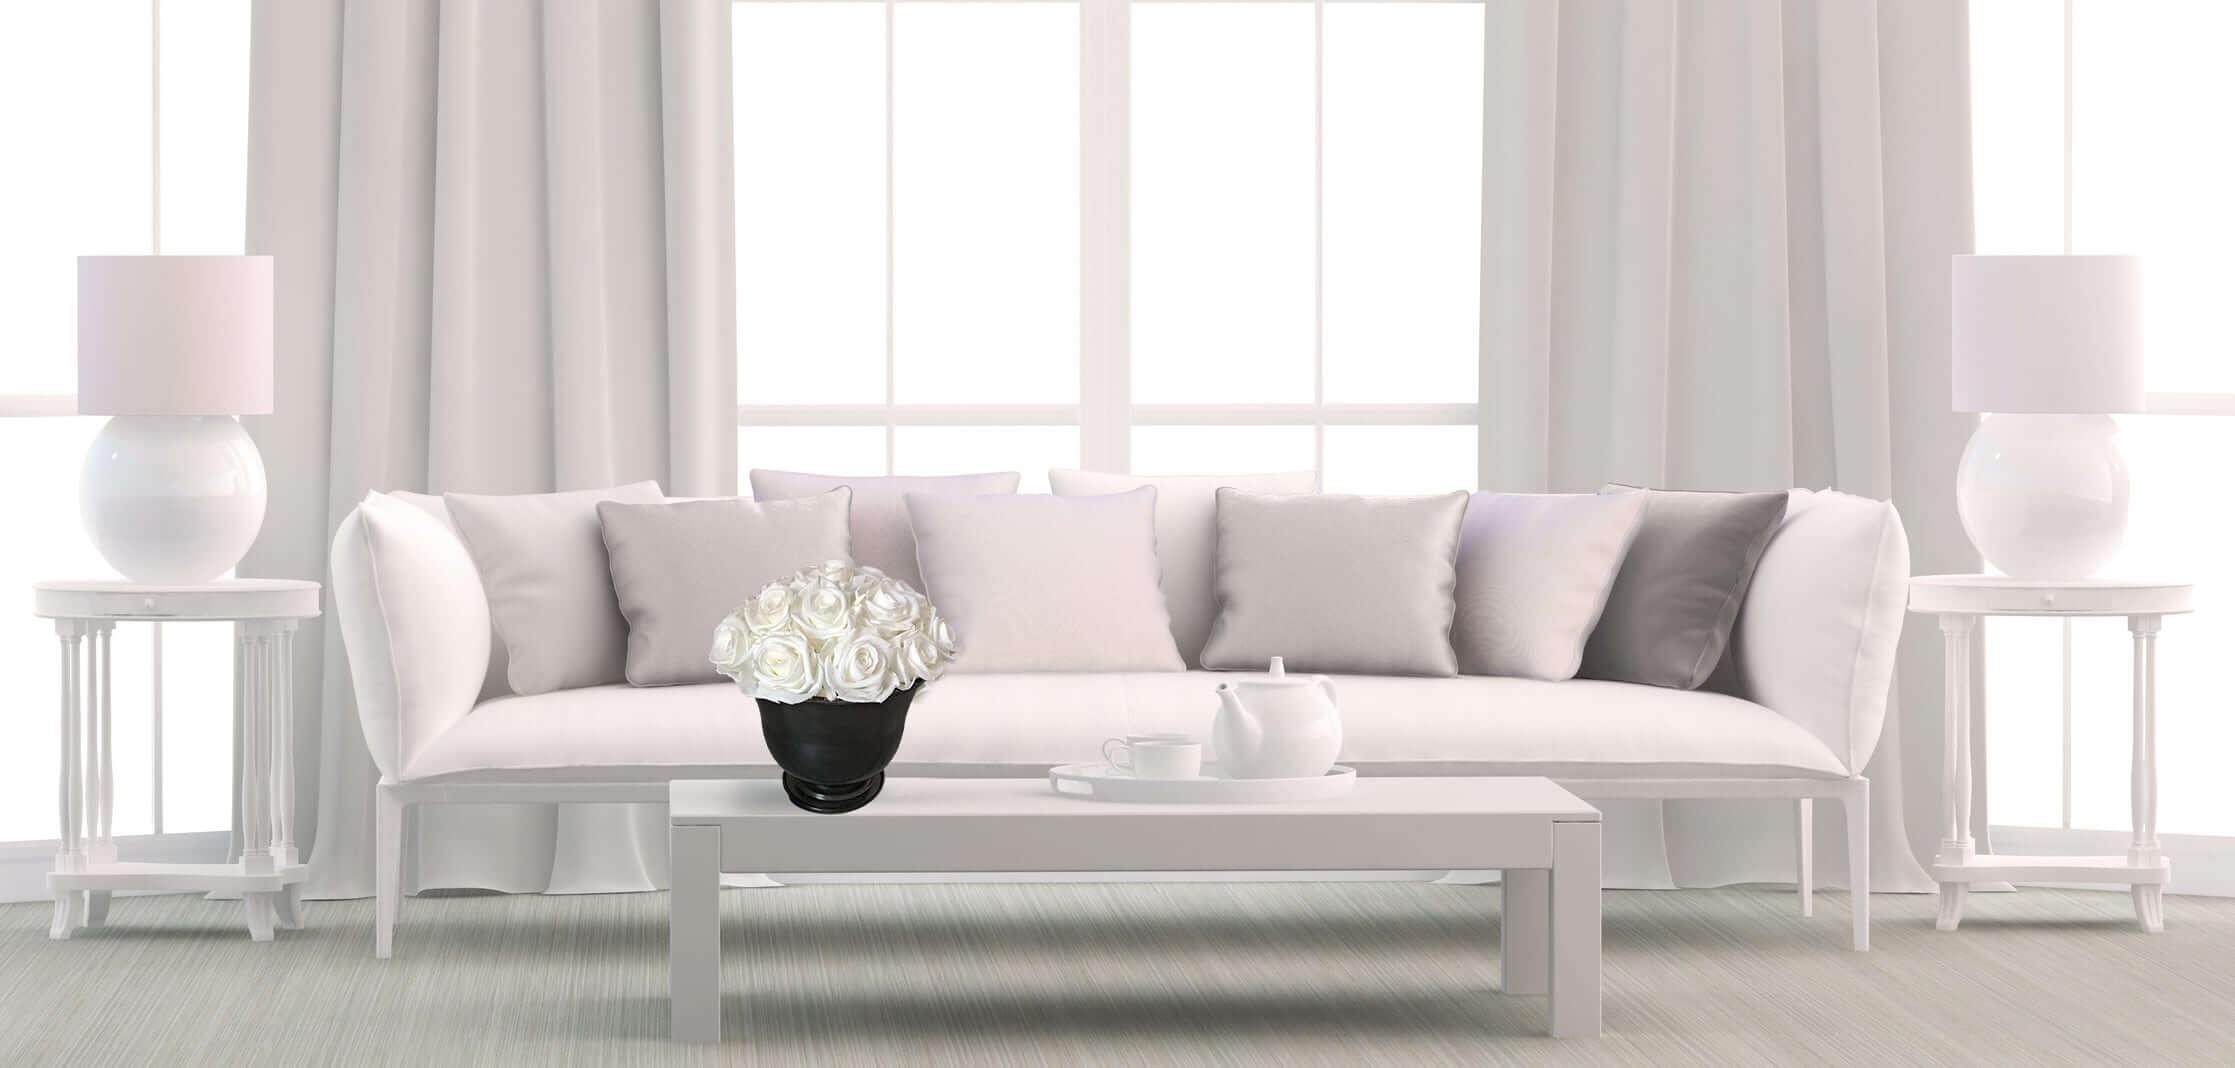 Heinau White Roses Floral Arrangement on Table Interior